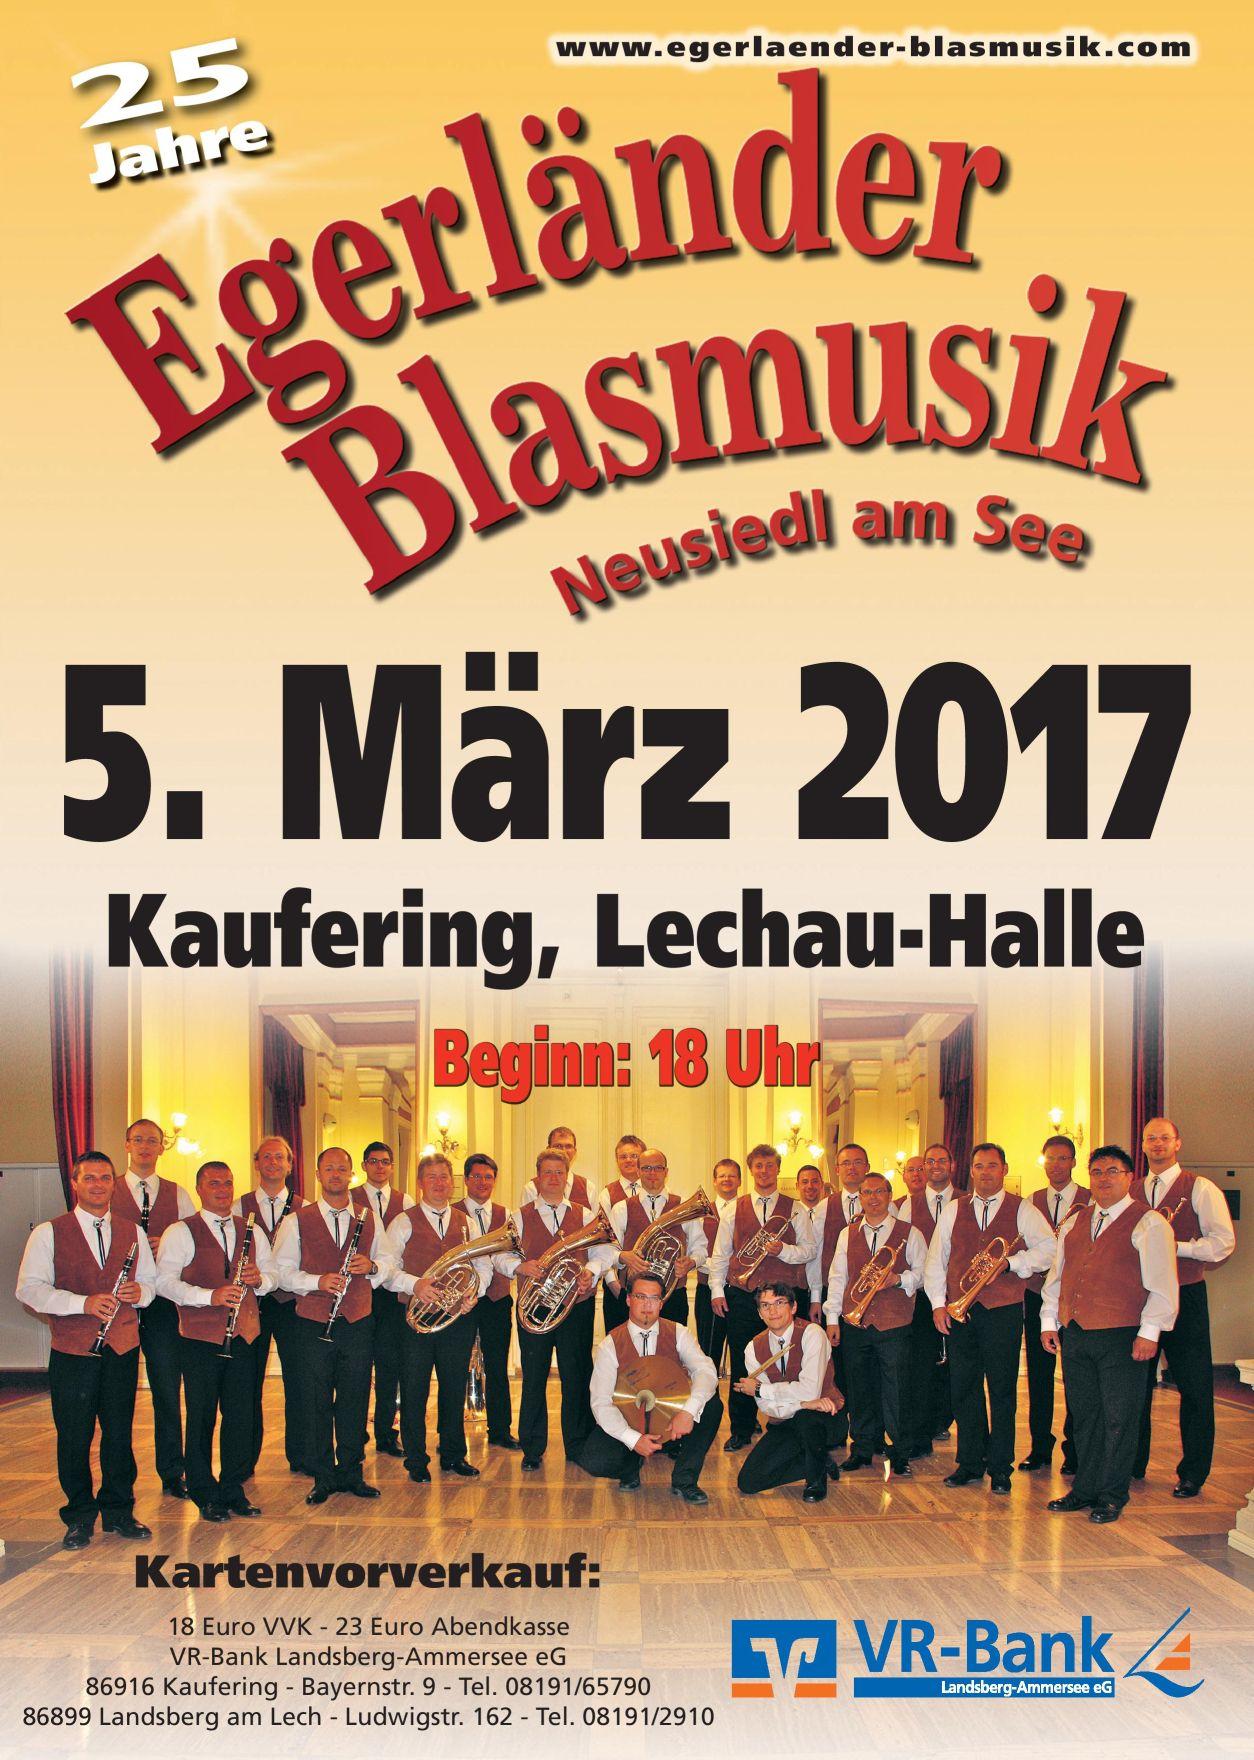 Egerländer Konzert